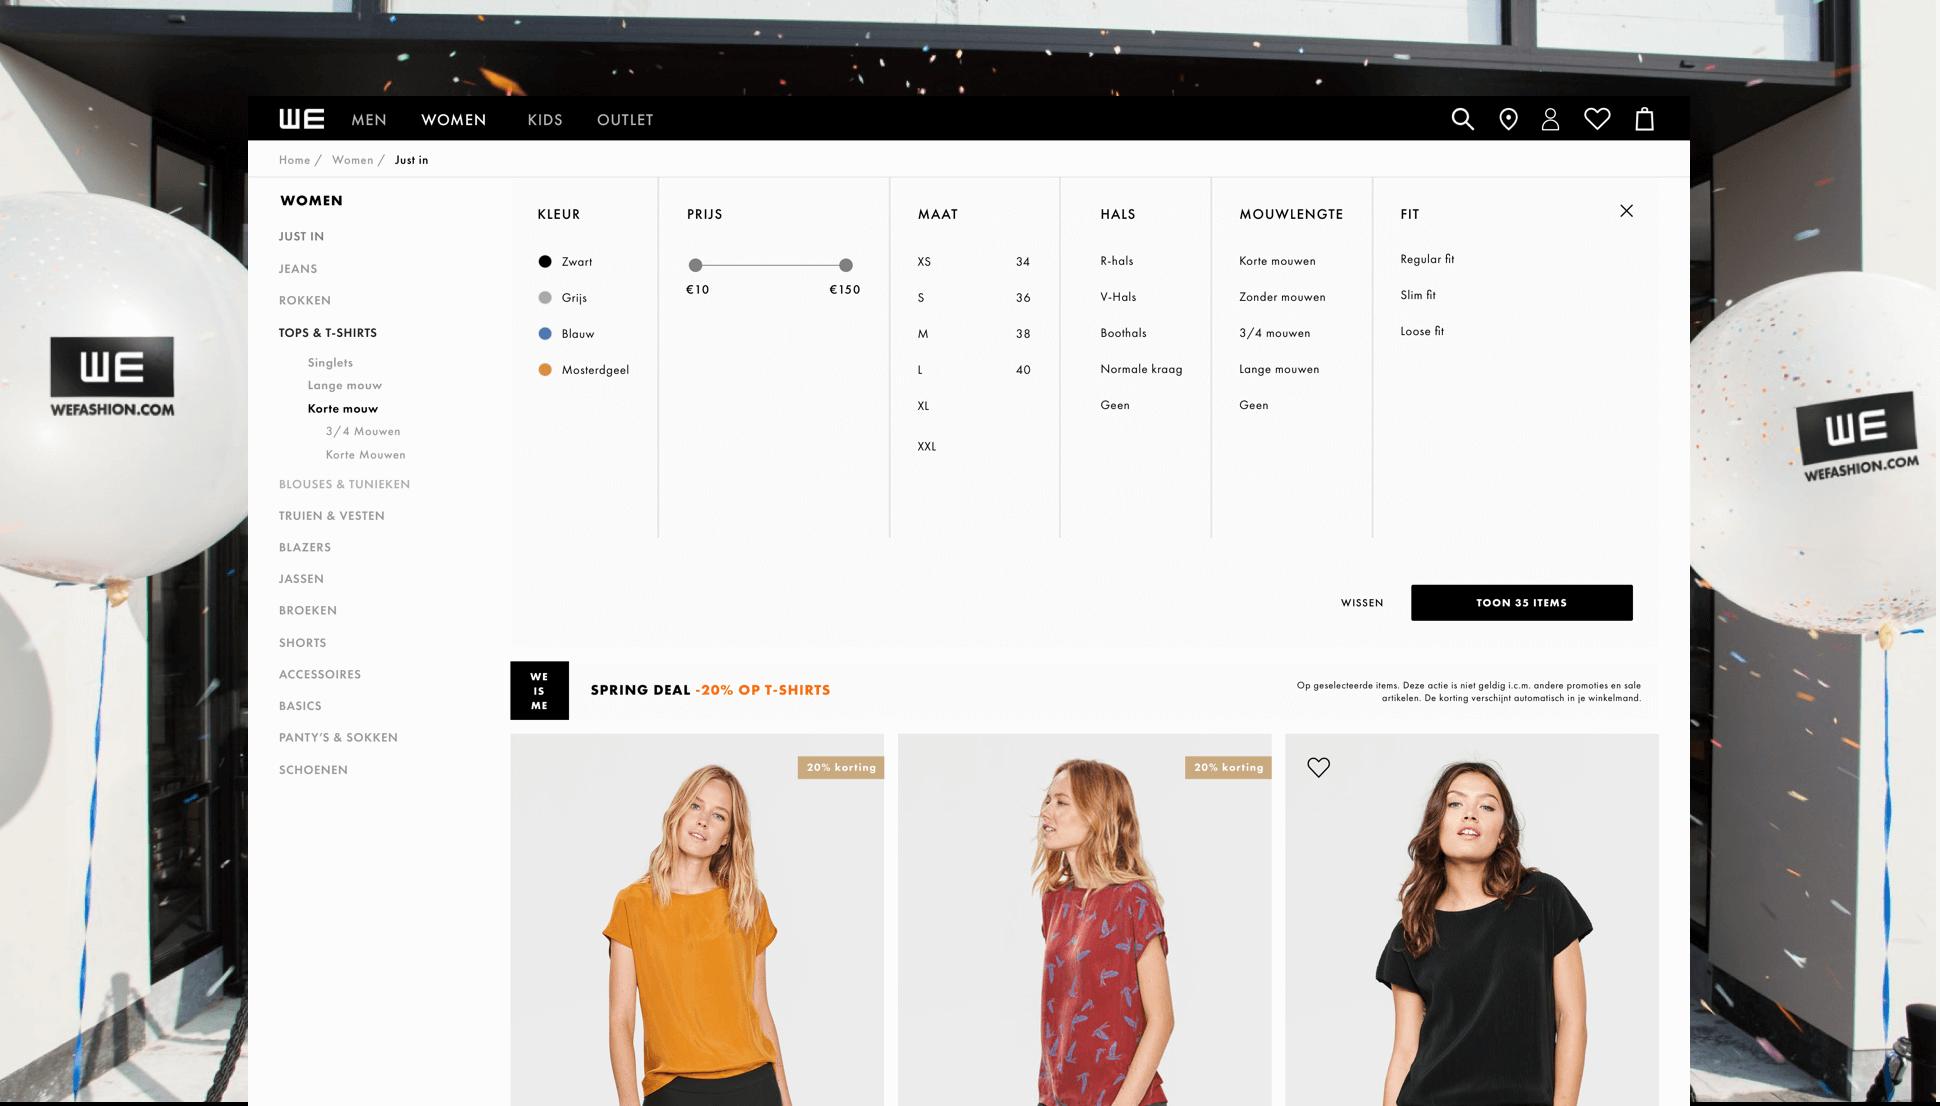 WE-Fashion webshop